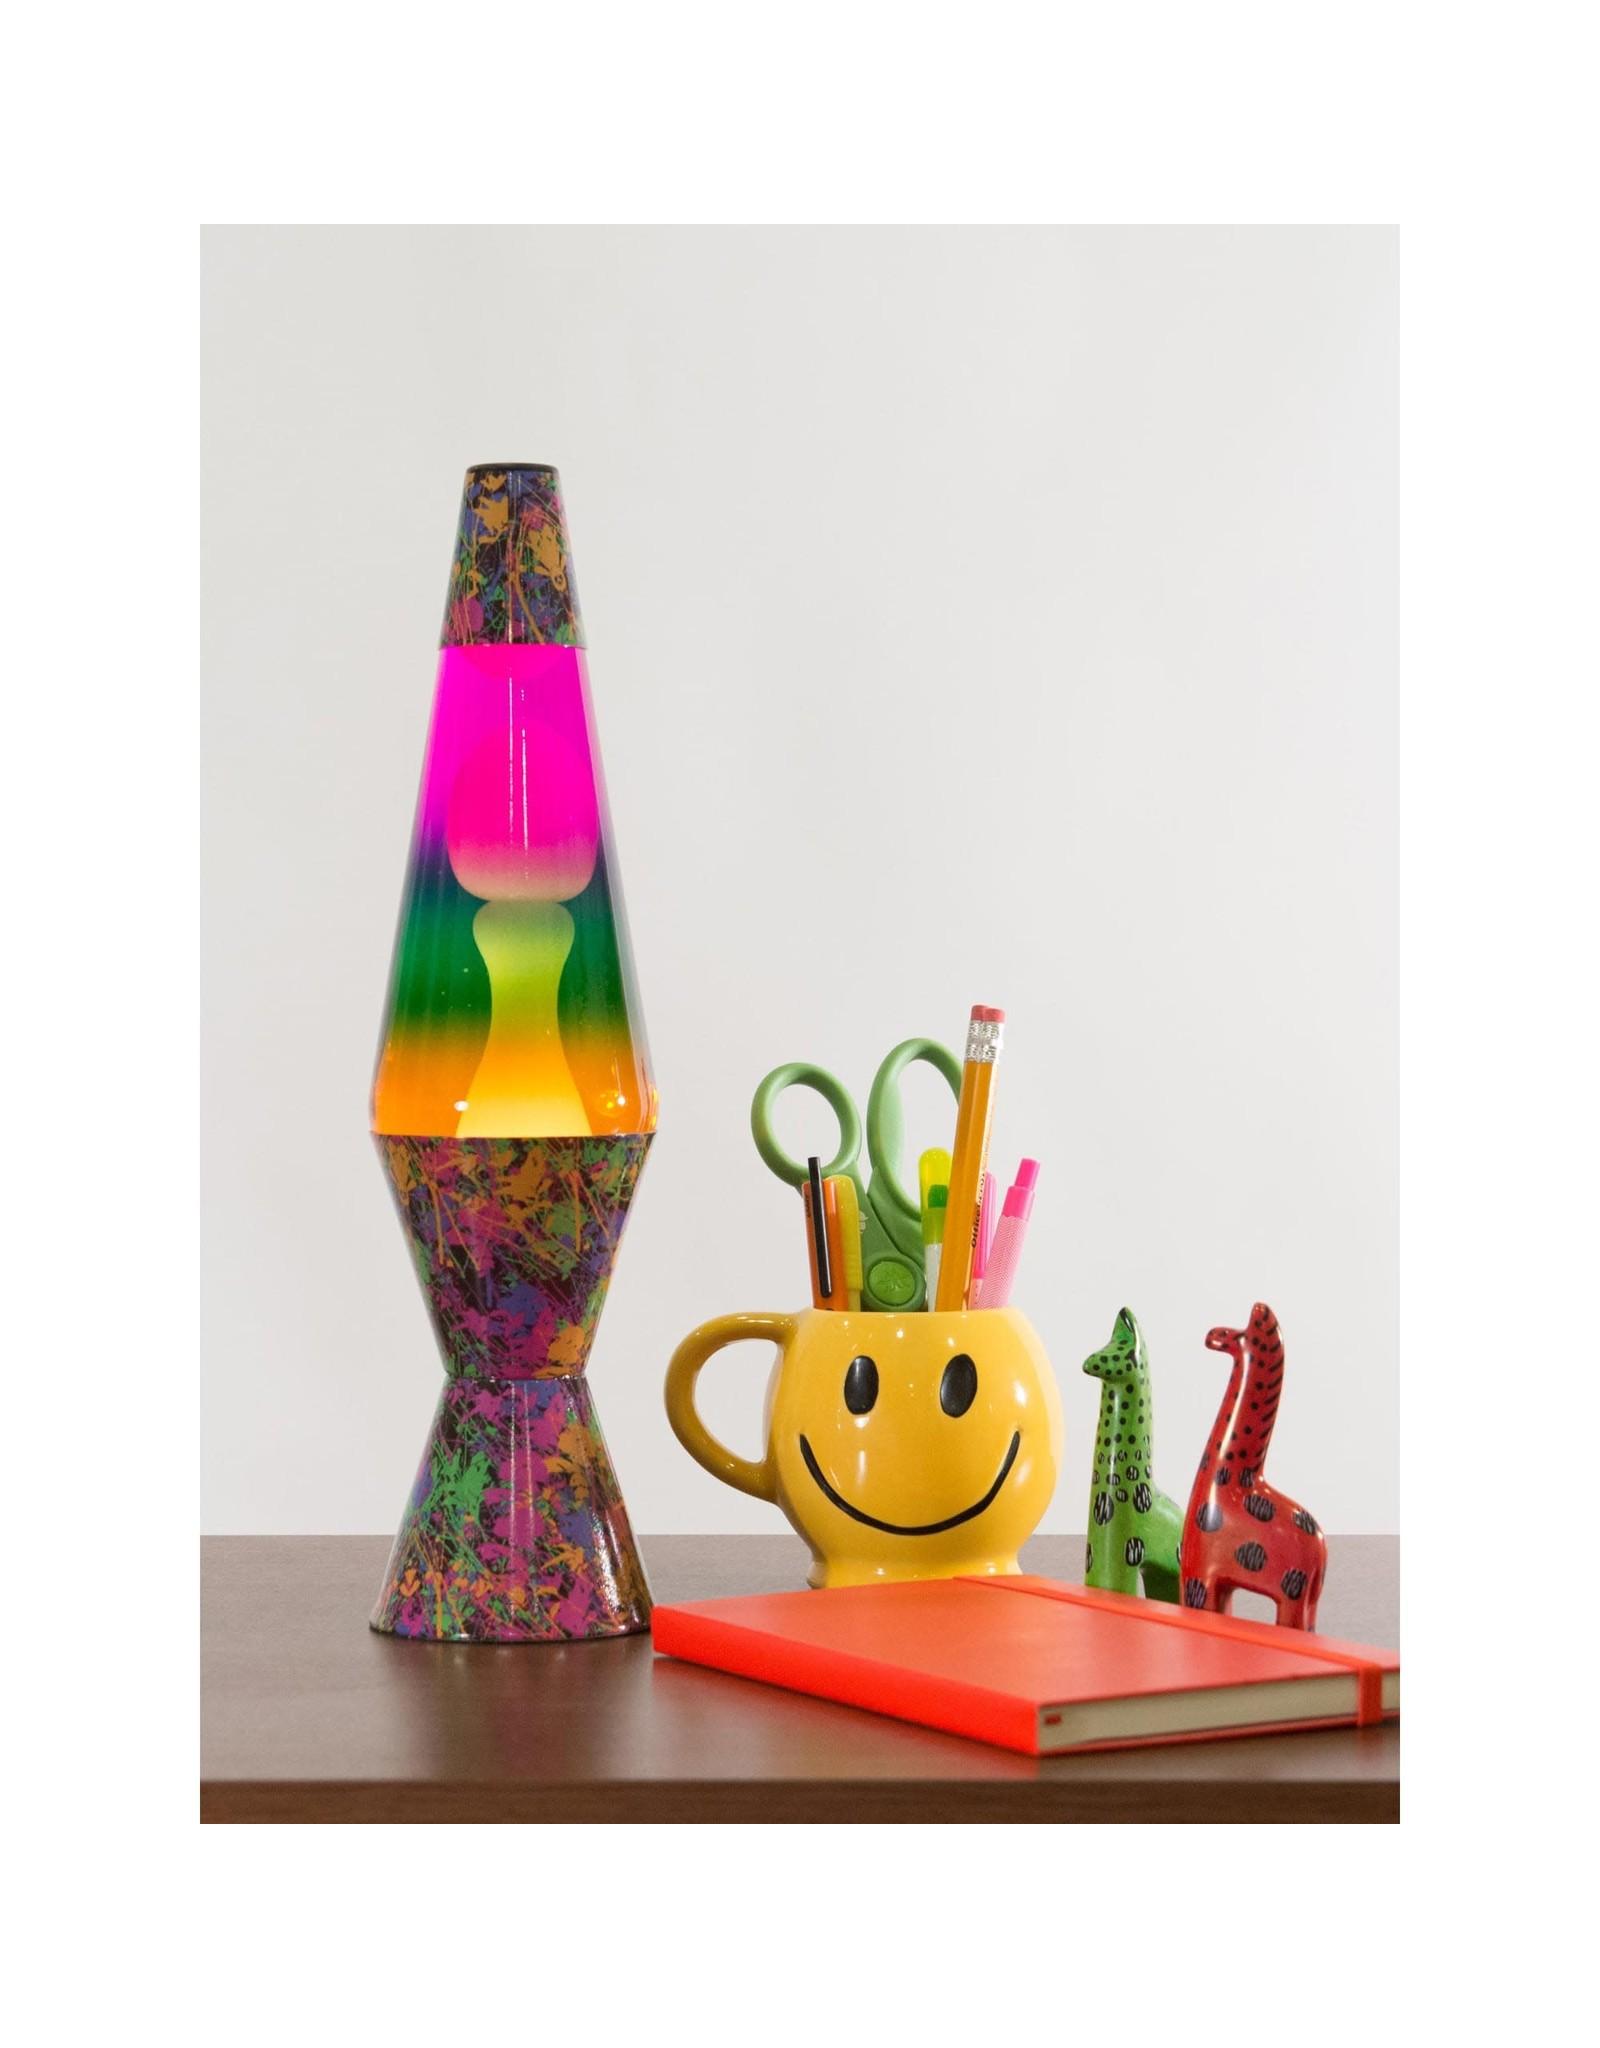 "Lava 14.5"" Lava Lamp Colormax Paintball - White/Tricolor"